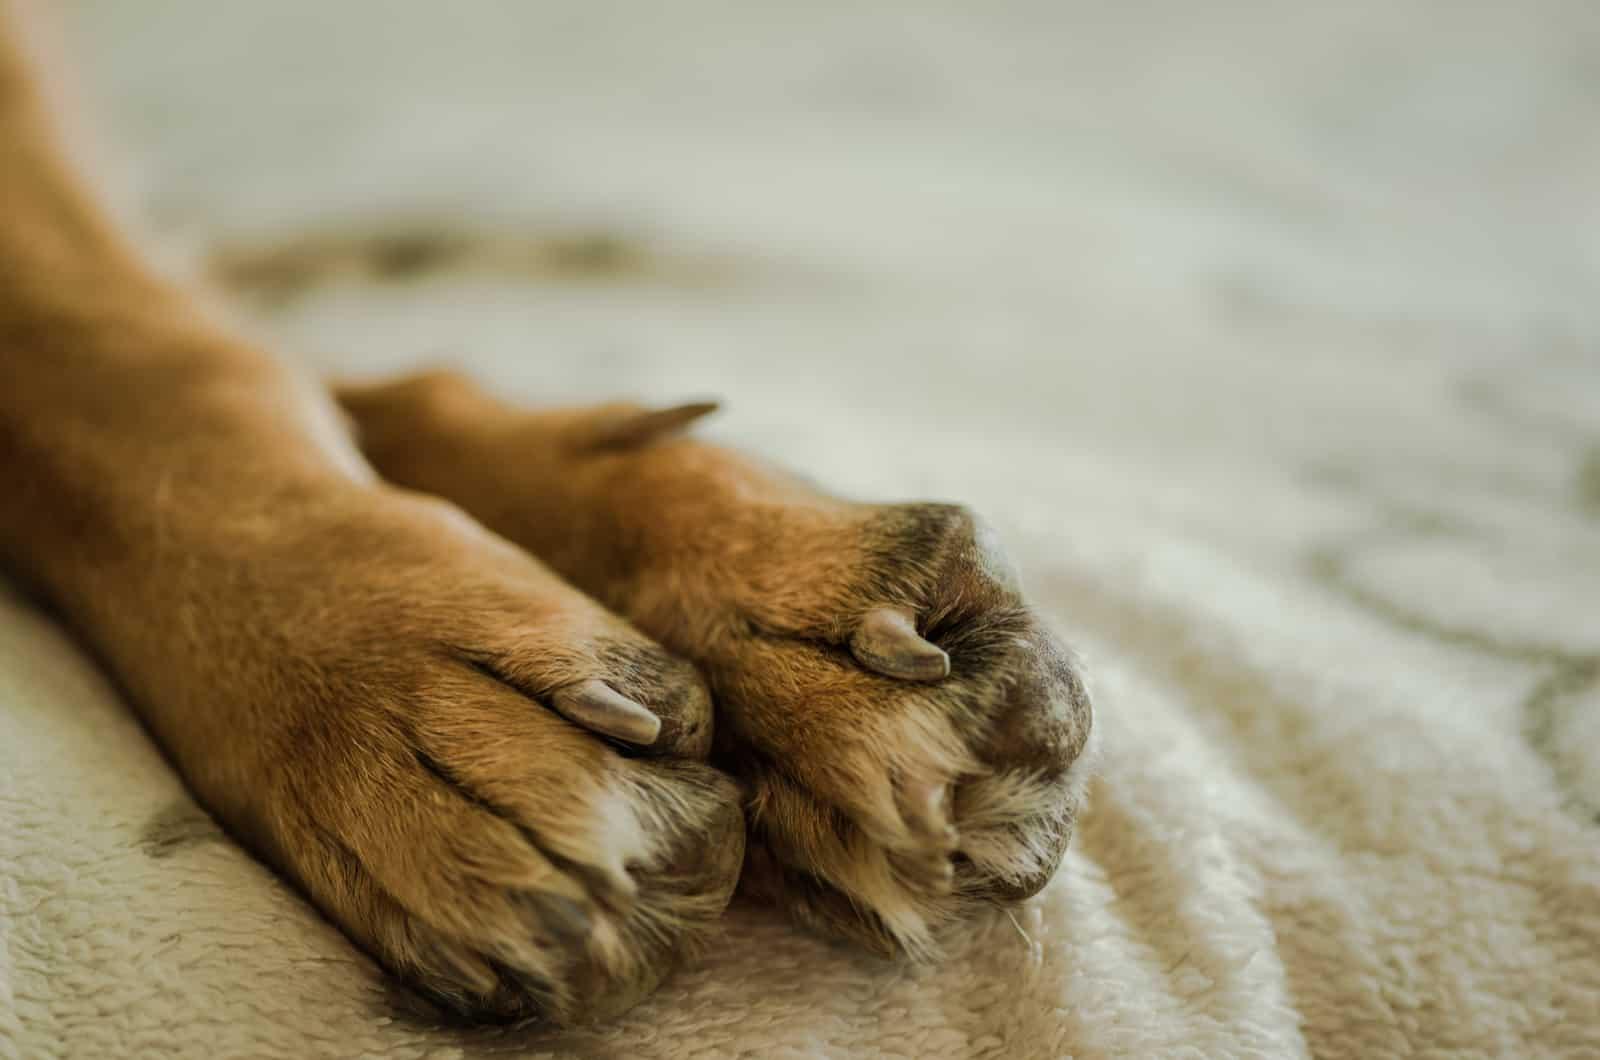 german shepherd paws close-up